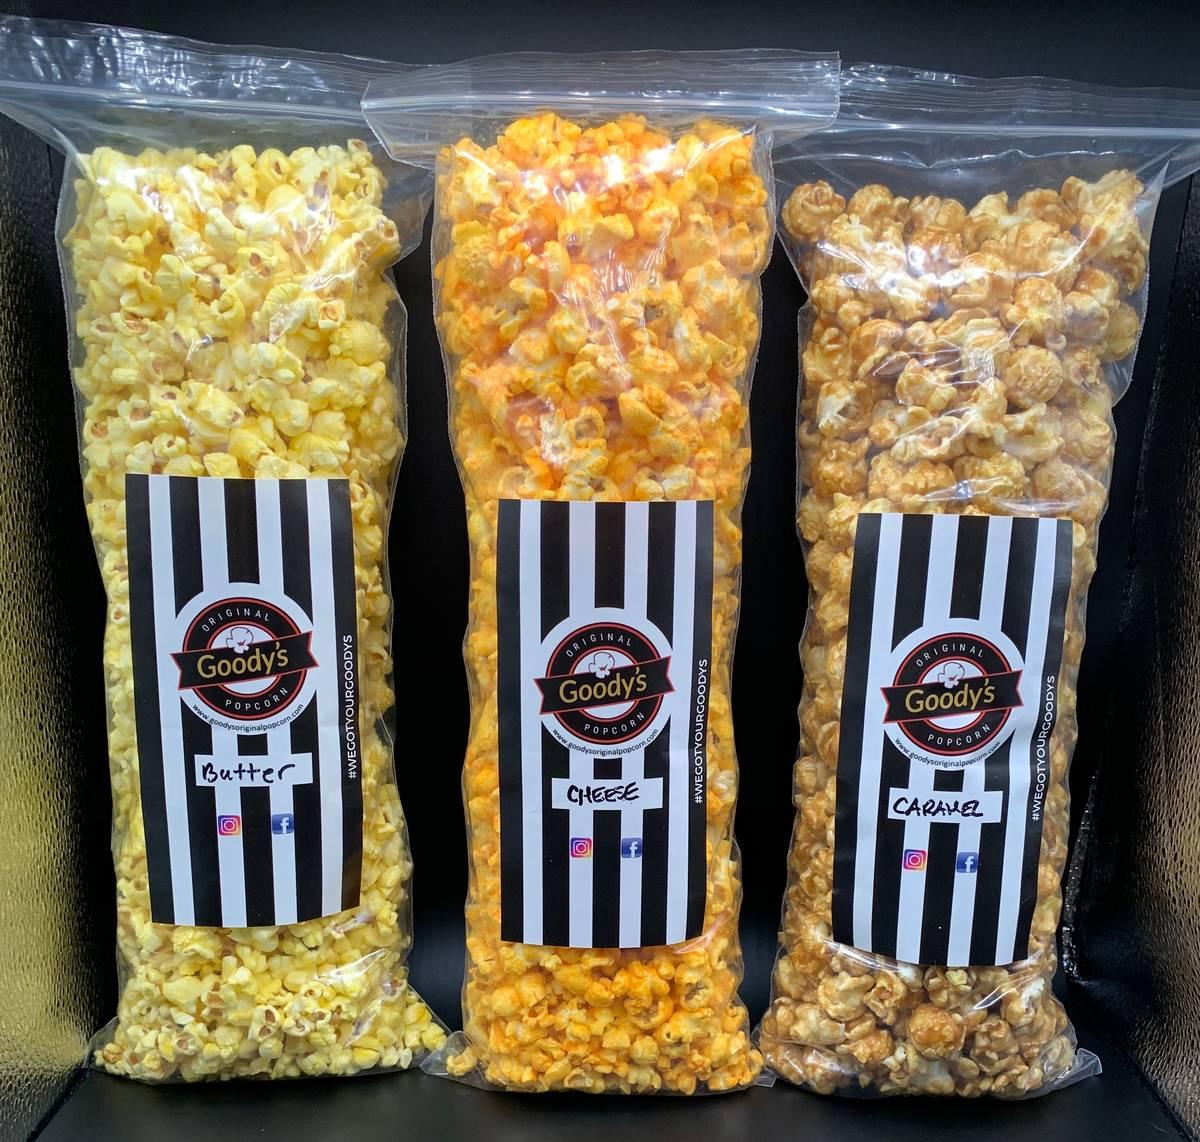 Goody's Original Popcorn